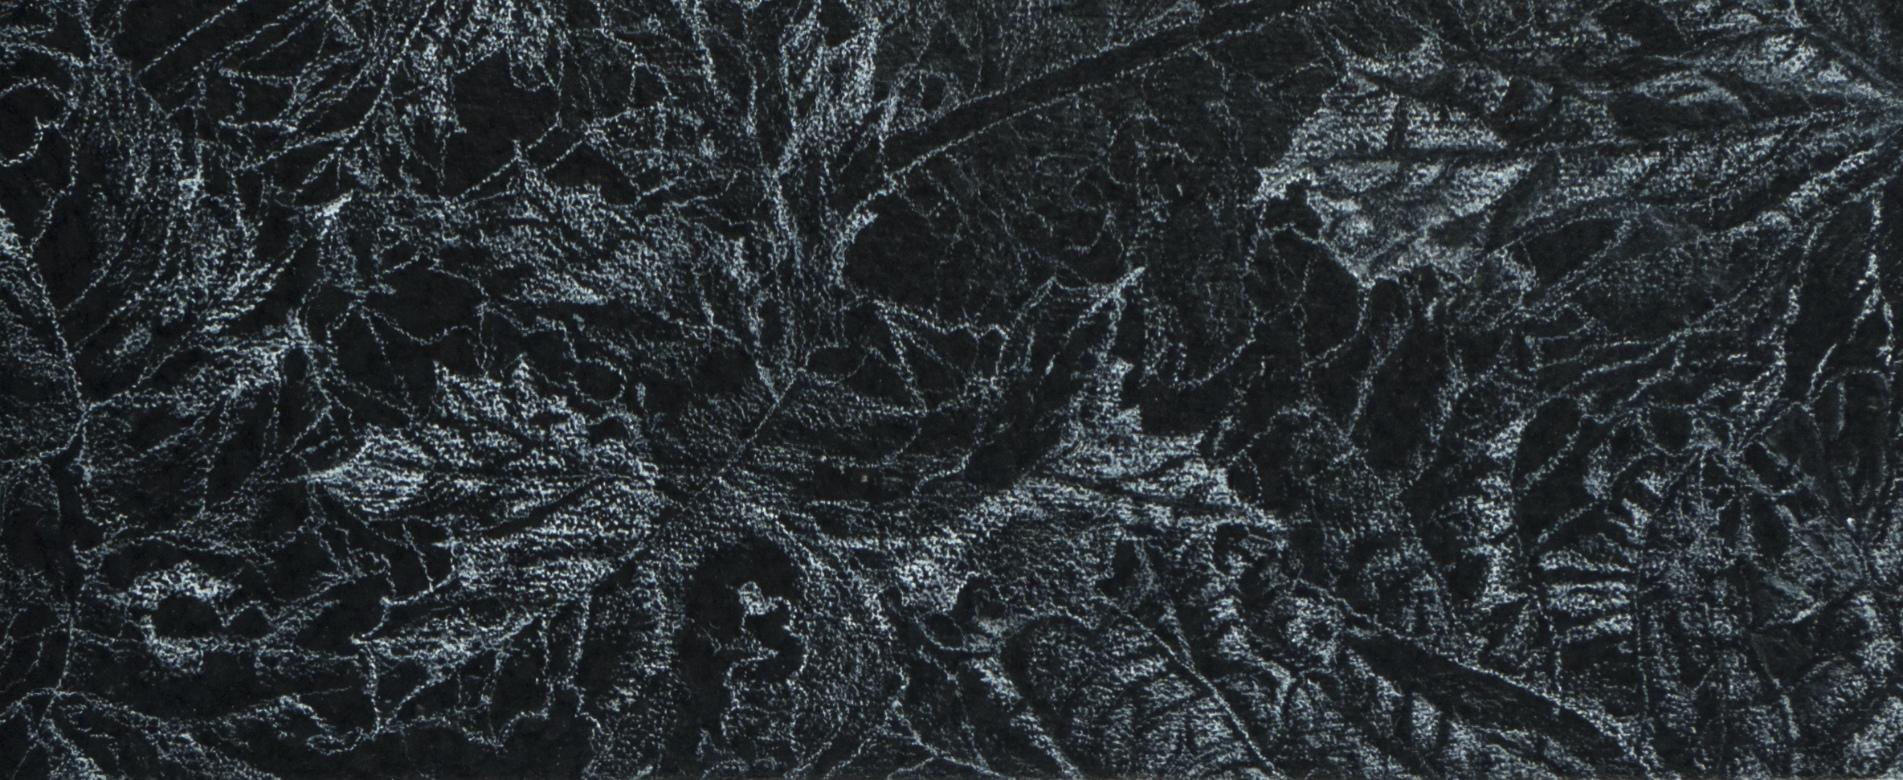 Blackboard-w11-4-72dpi